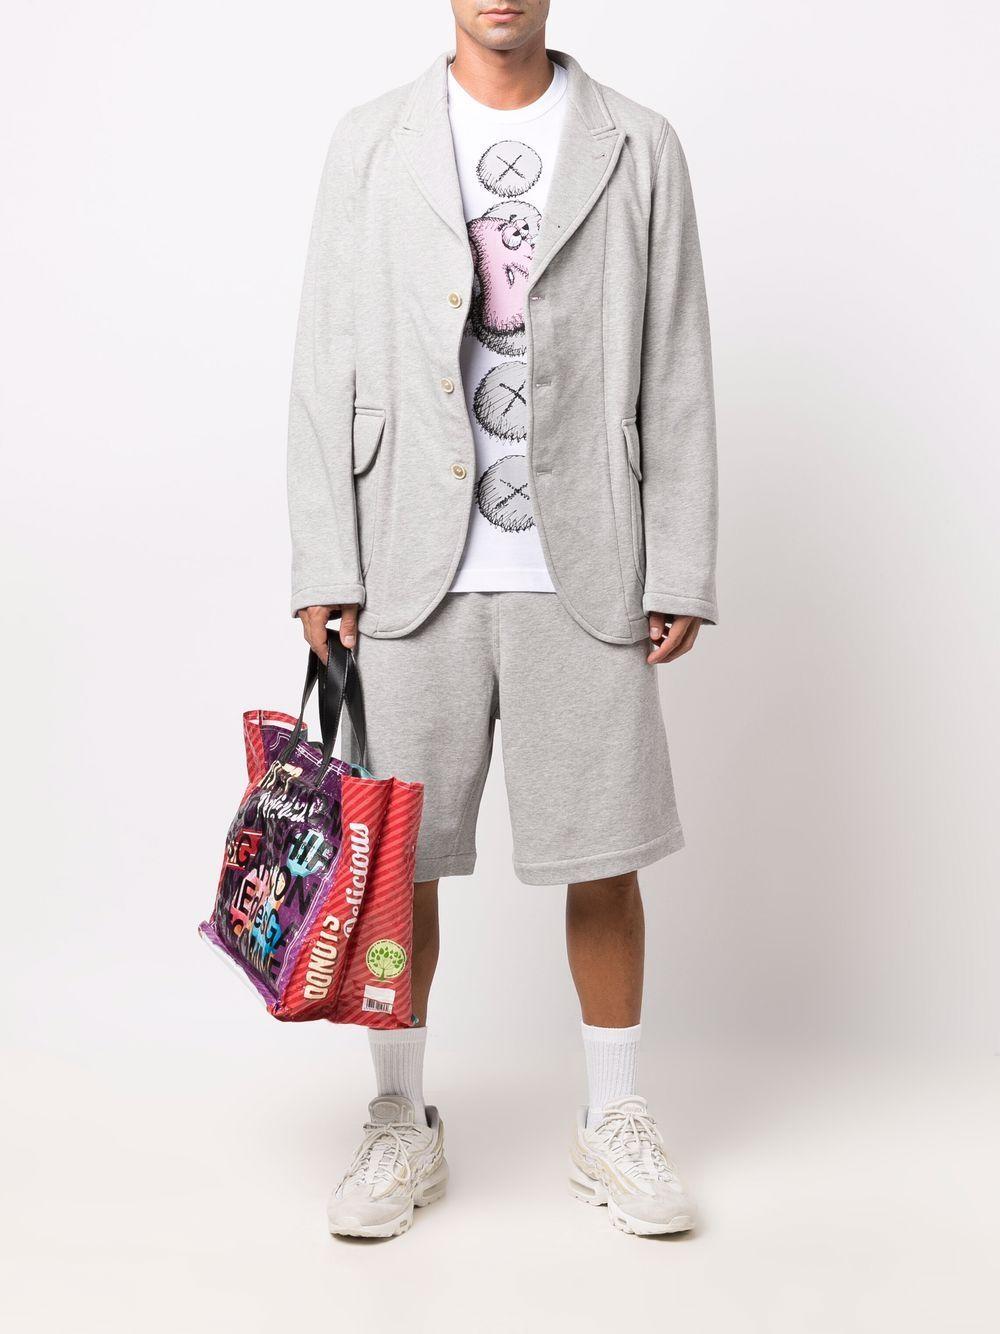 sport shorts man gray in cotton COMME DES GARÇONS SHIRT | Shorts | FH-P013-W211